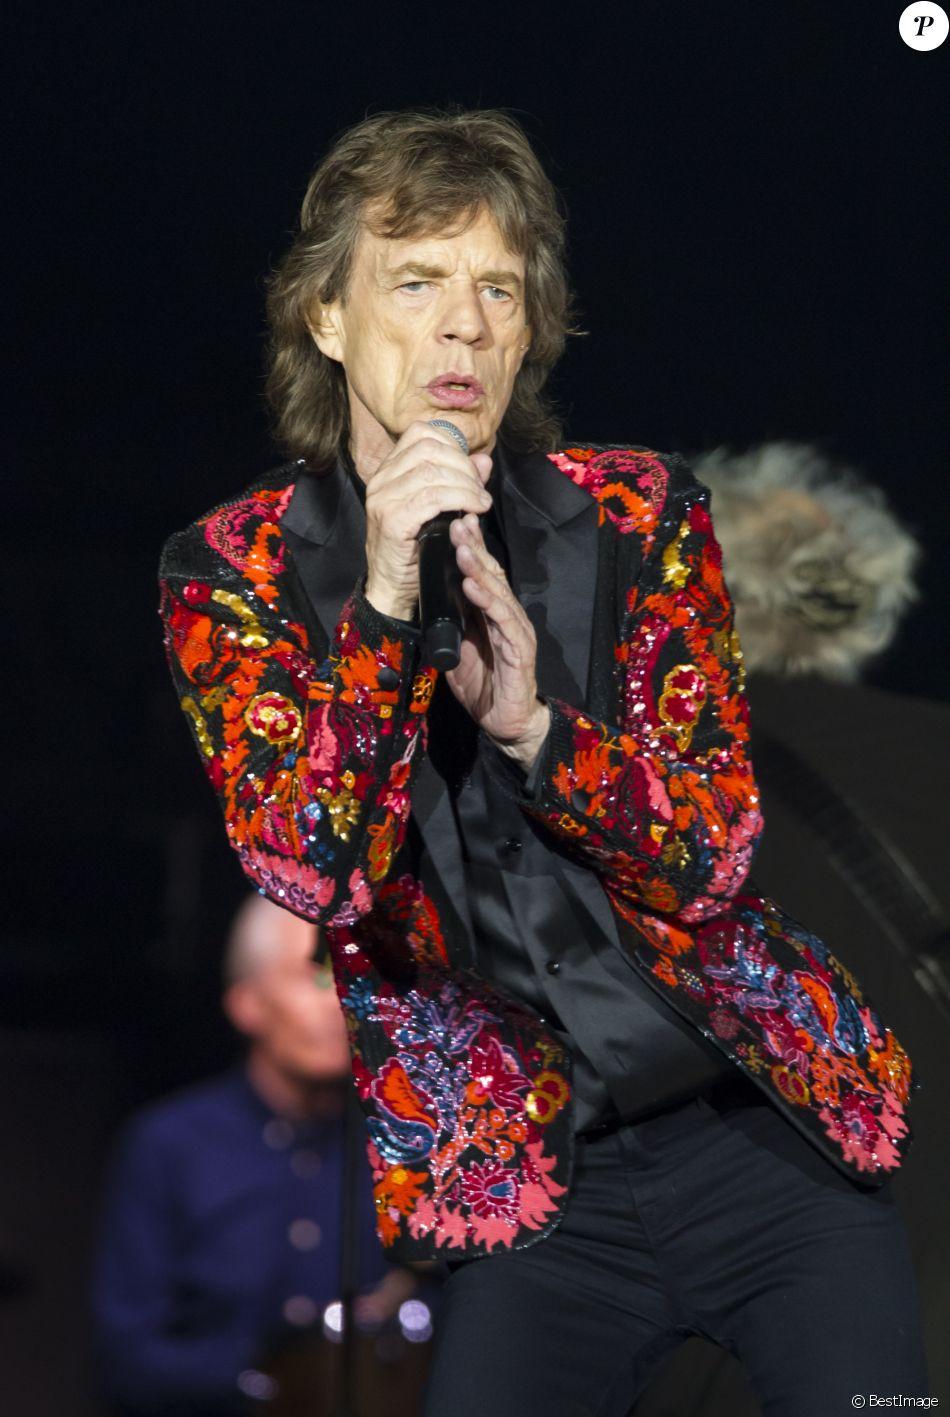 Mick Jagger - Les Rolling Stones en concert à la U Arena de Nanterre, le 22 octobre 2017 (2ème date). © Danyellah P. / Bestimage